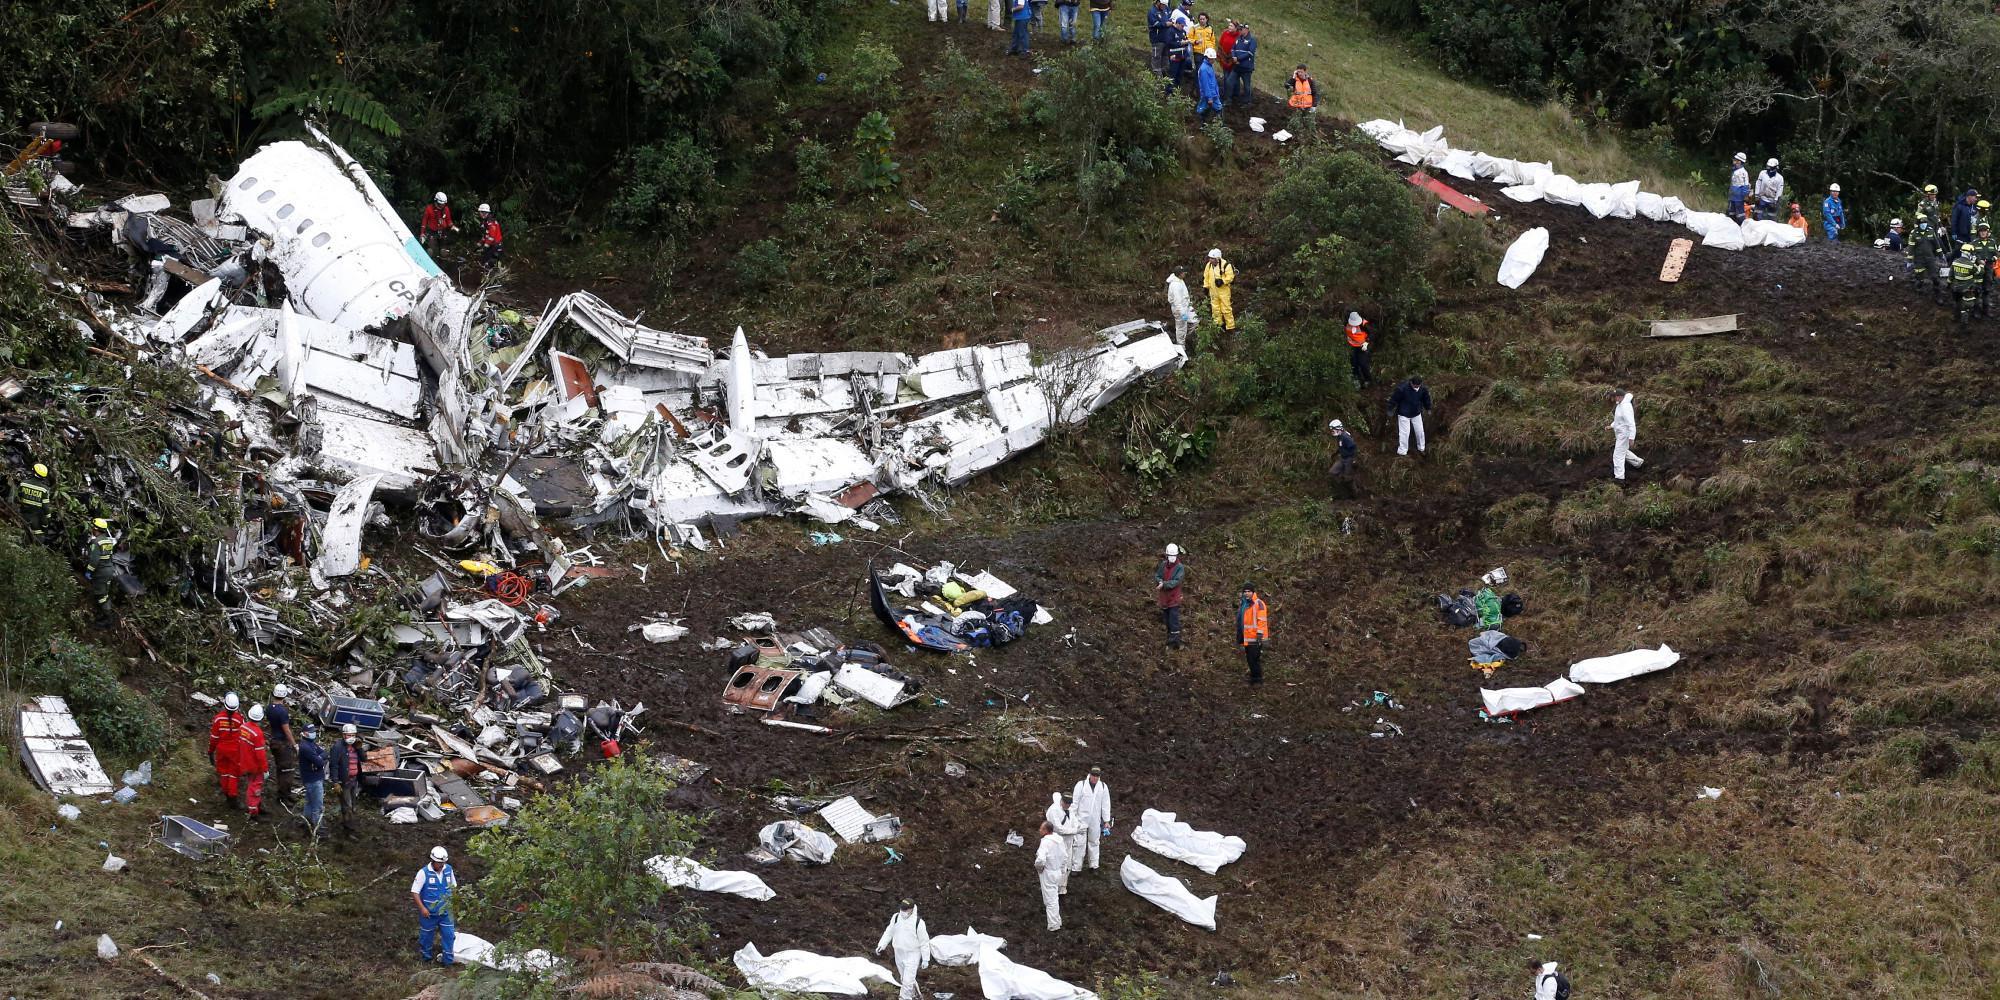 aeroporiki-tragodia-podosfairiki-omada-kolomvias-1000 71 είναι οι νεκροί από την αεροπορική τραγωδία στην Κολομβία- 4 δεν επιβιβάστηκαν στο αεροπλάνο